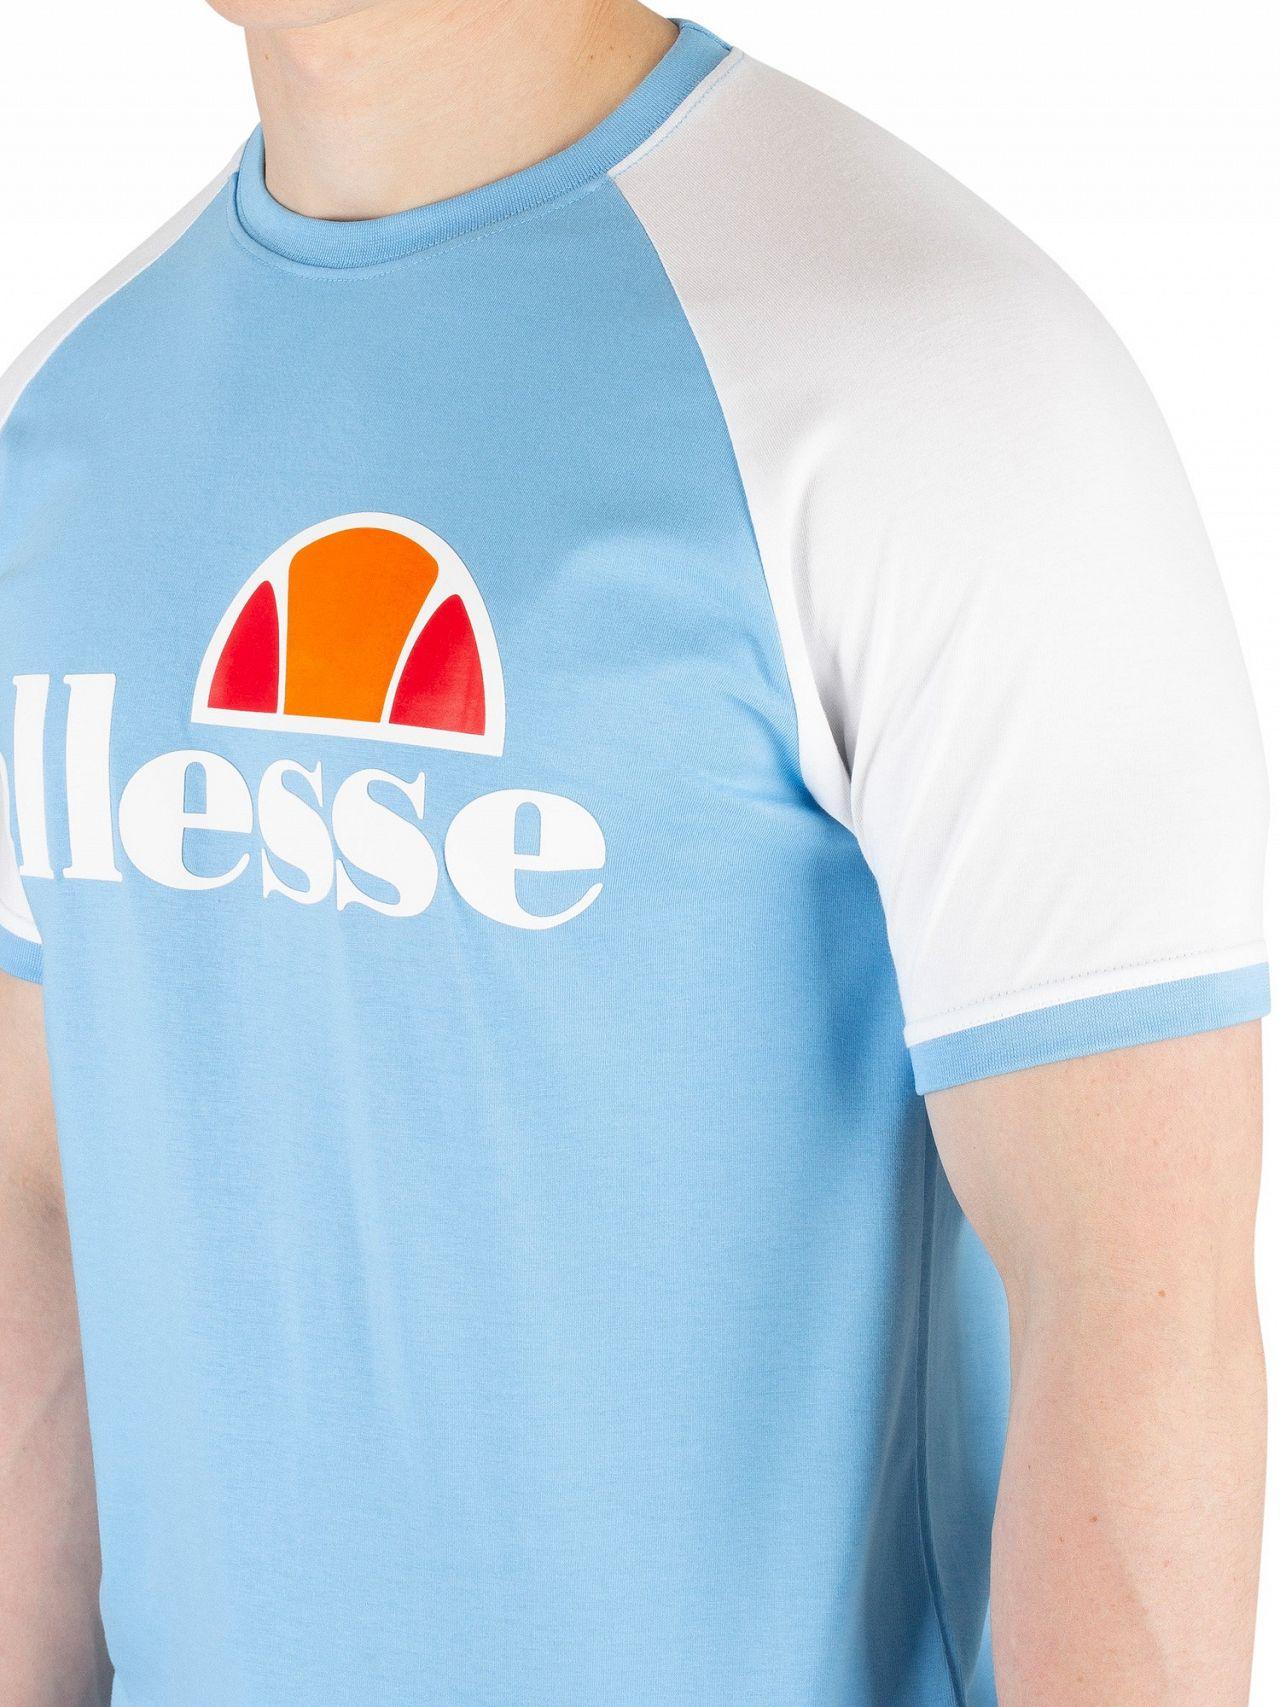 74445611 Ellesse Light Blue Cassina T-Shirt